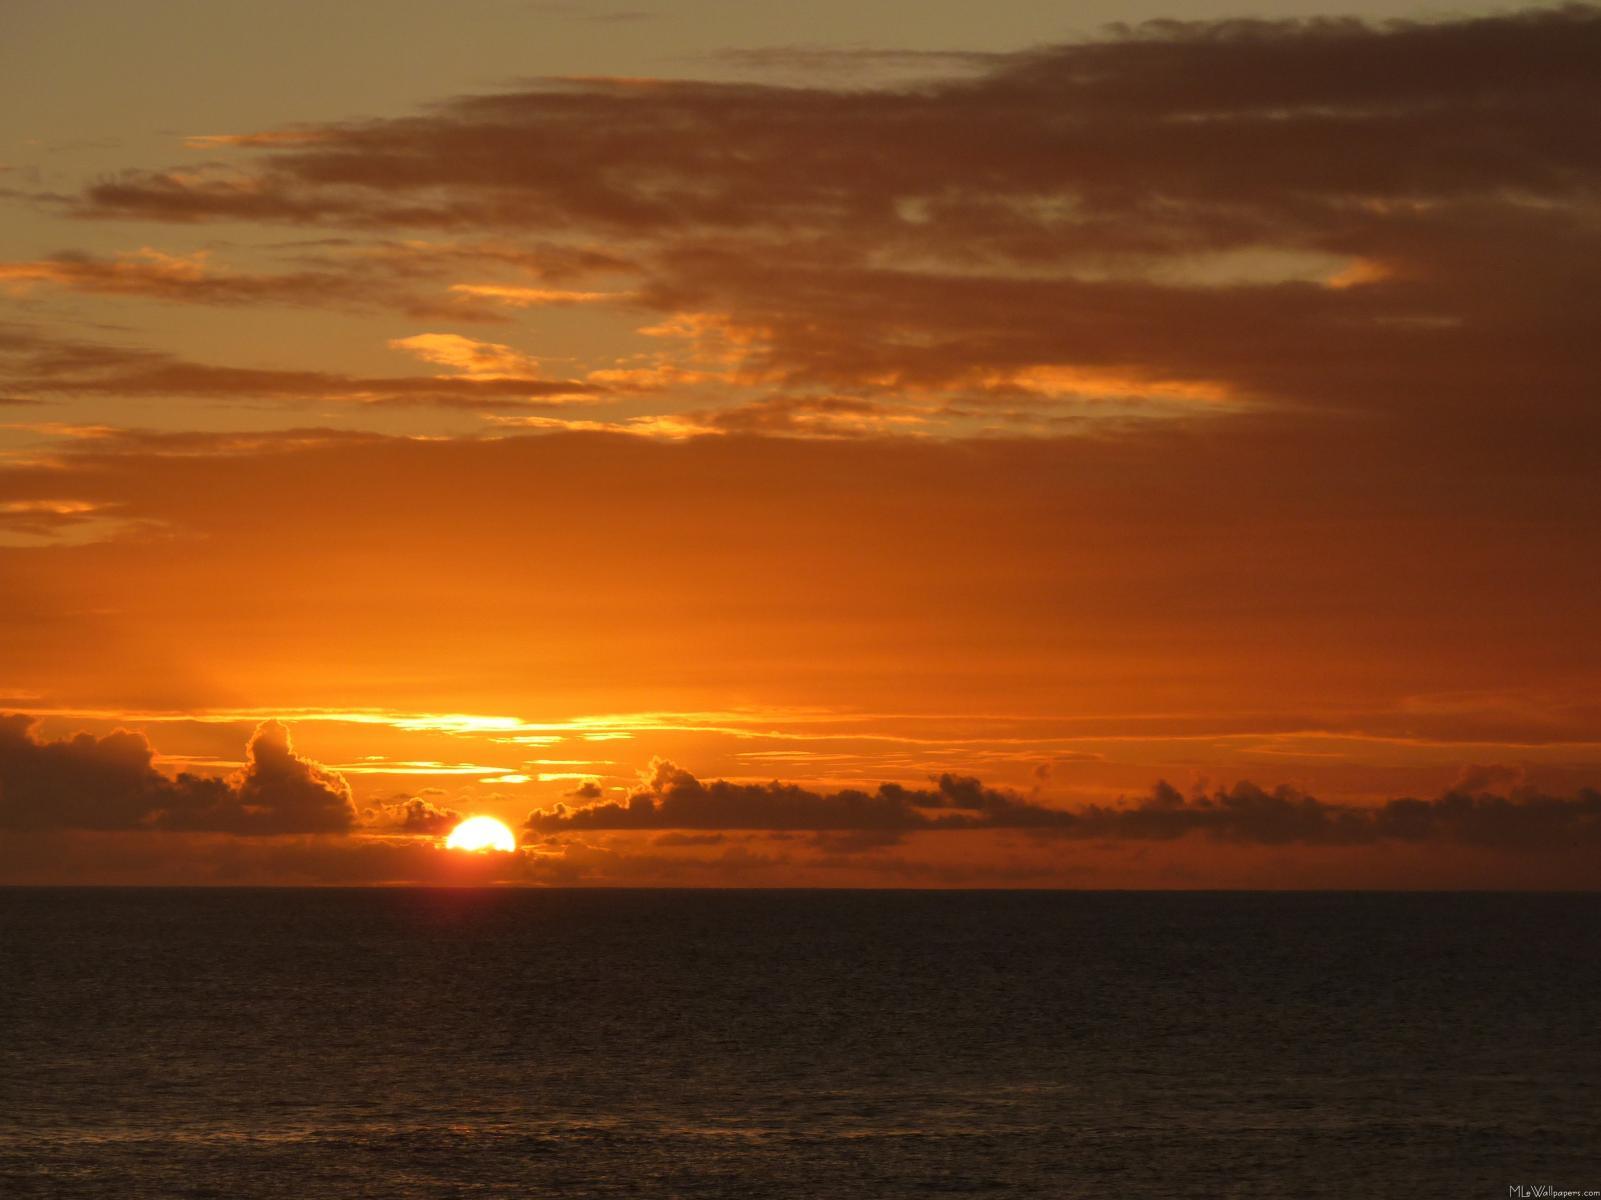 Caribbean Sunset Wallpaper Desktop - 117.0KB